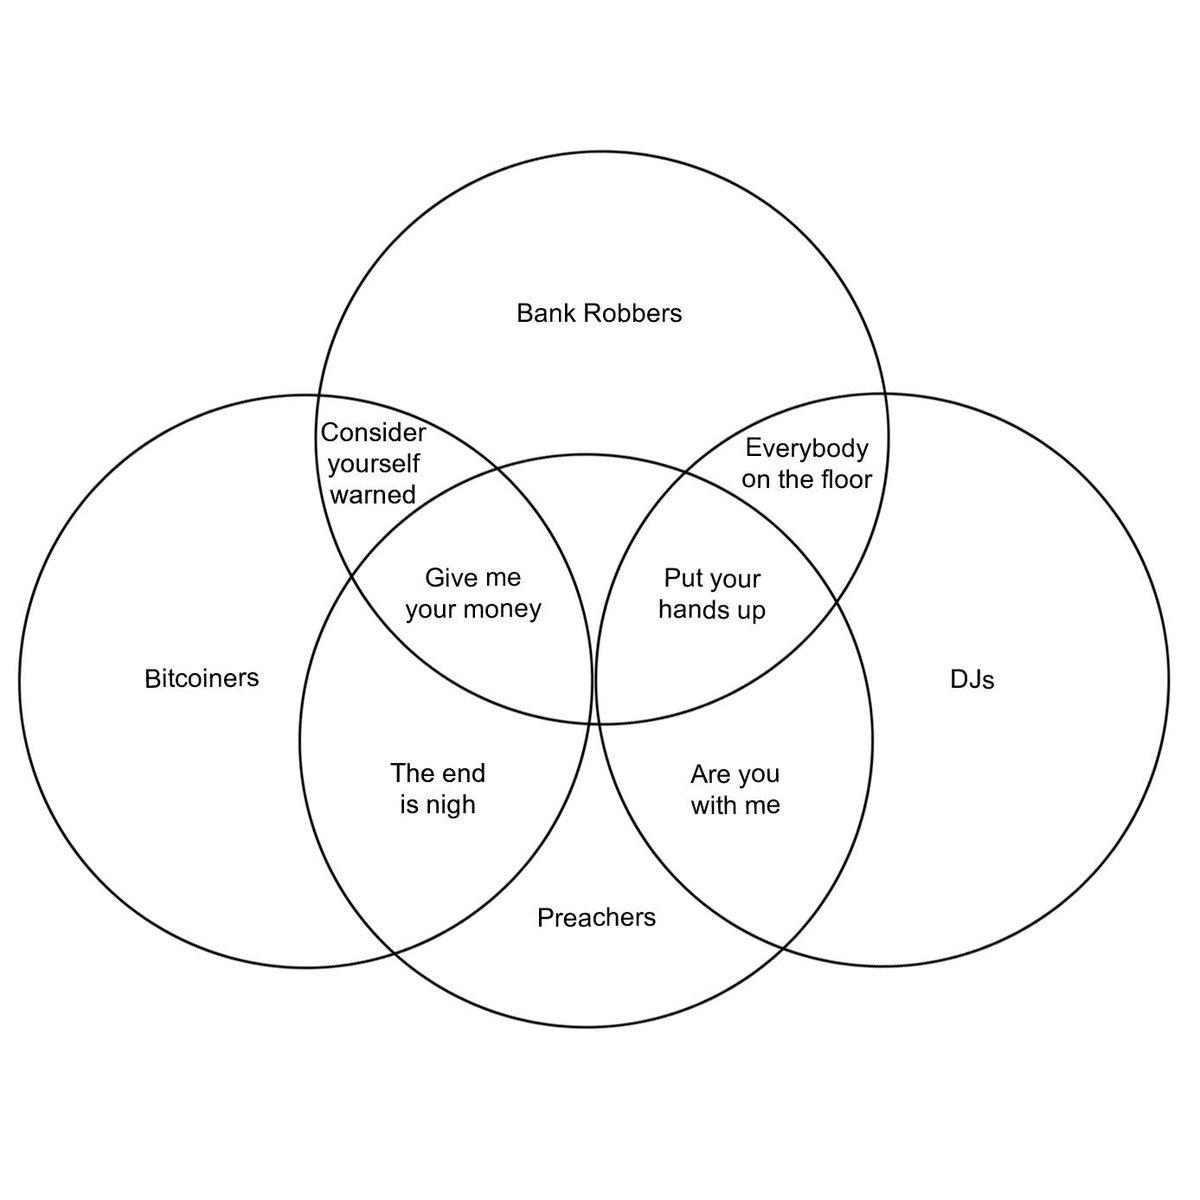 Tim Swanson On Twitter A Venn Diagram Consisting Of